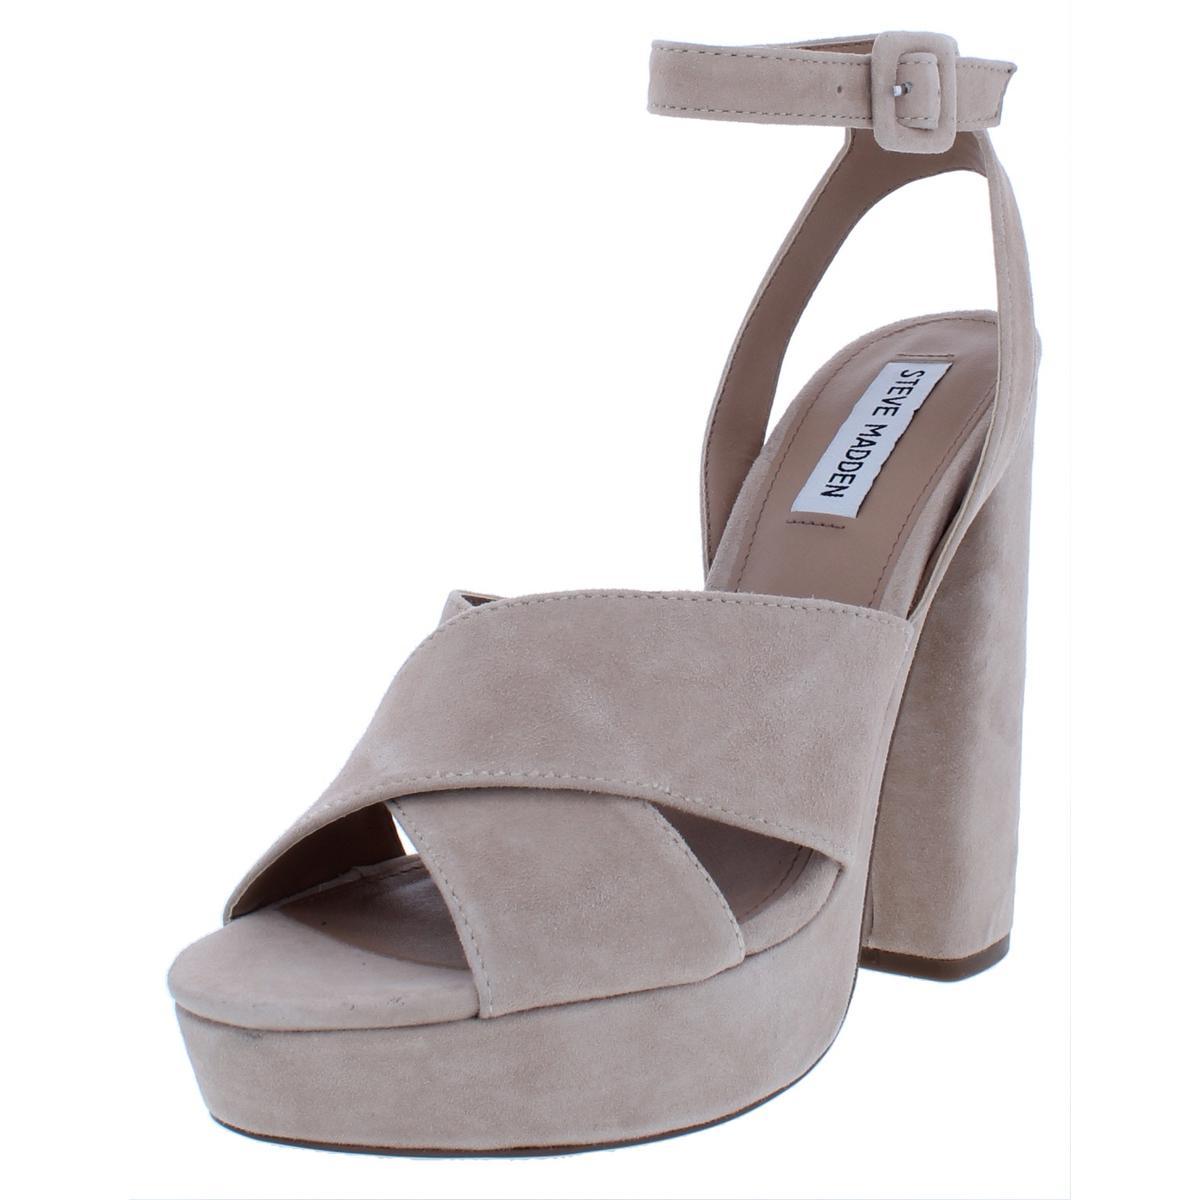 006700346796 Steve Madden Womens Jodi Beige Platform Sandals Heels 10 Medium (B